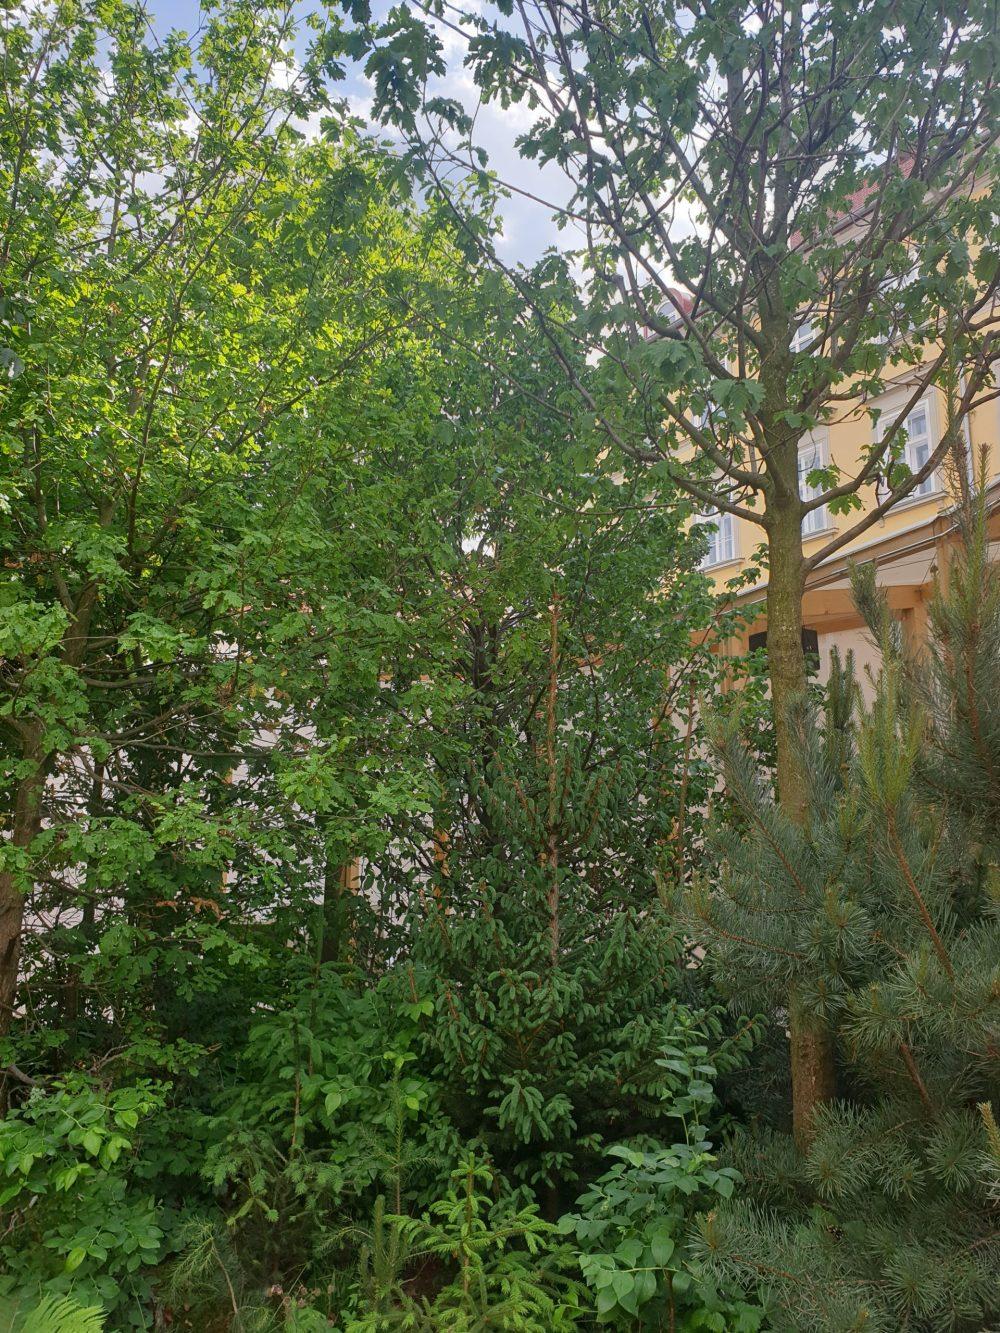 Klima-Pavillon am Grazer Freiheitsplatz